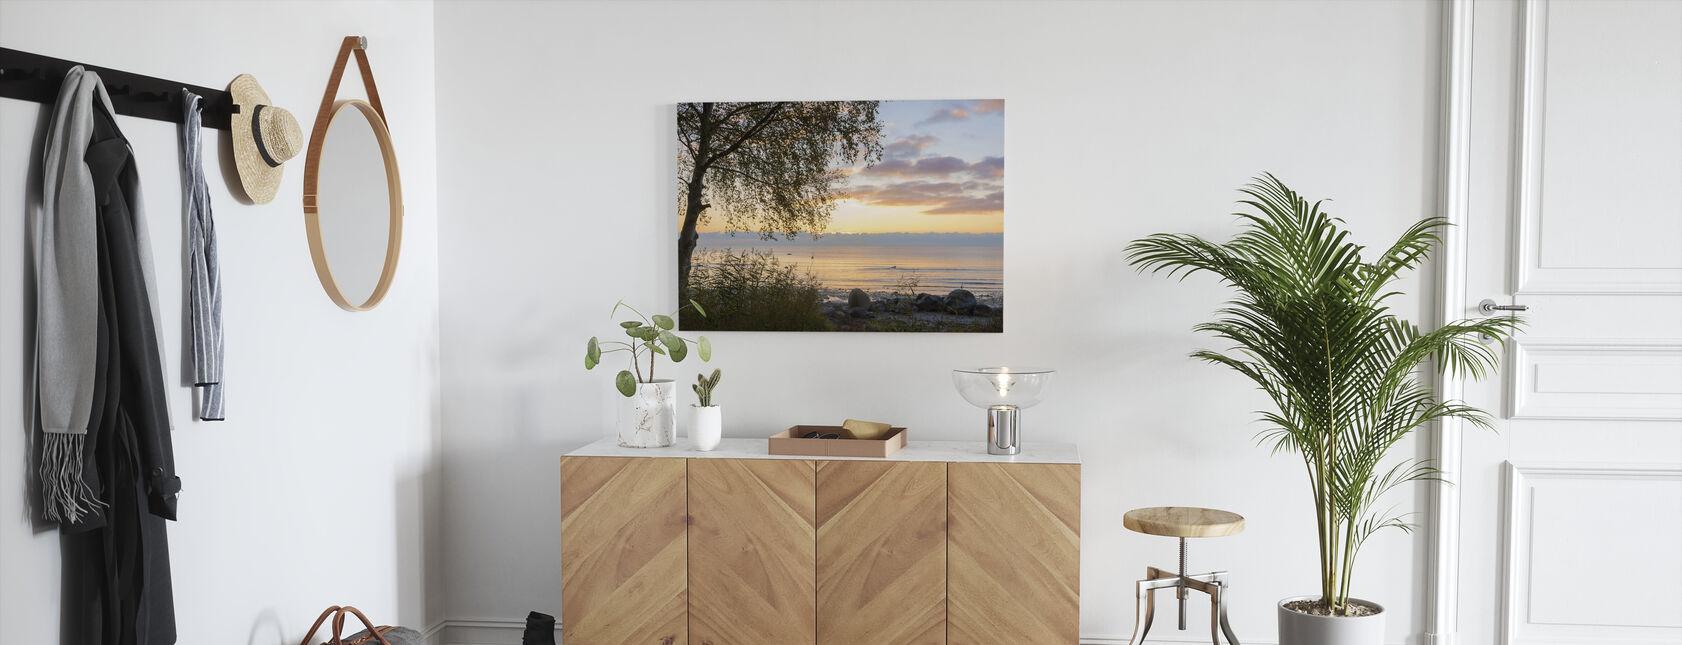 Boom bij zonsondergang - Gotland - Canvas print - Gang